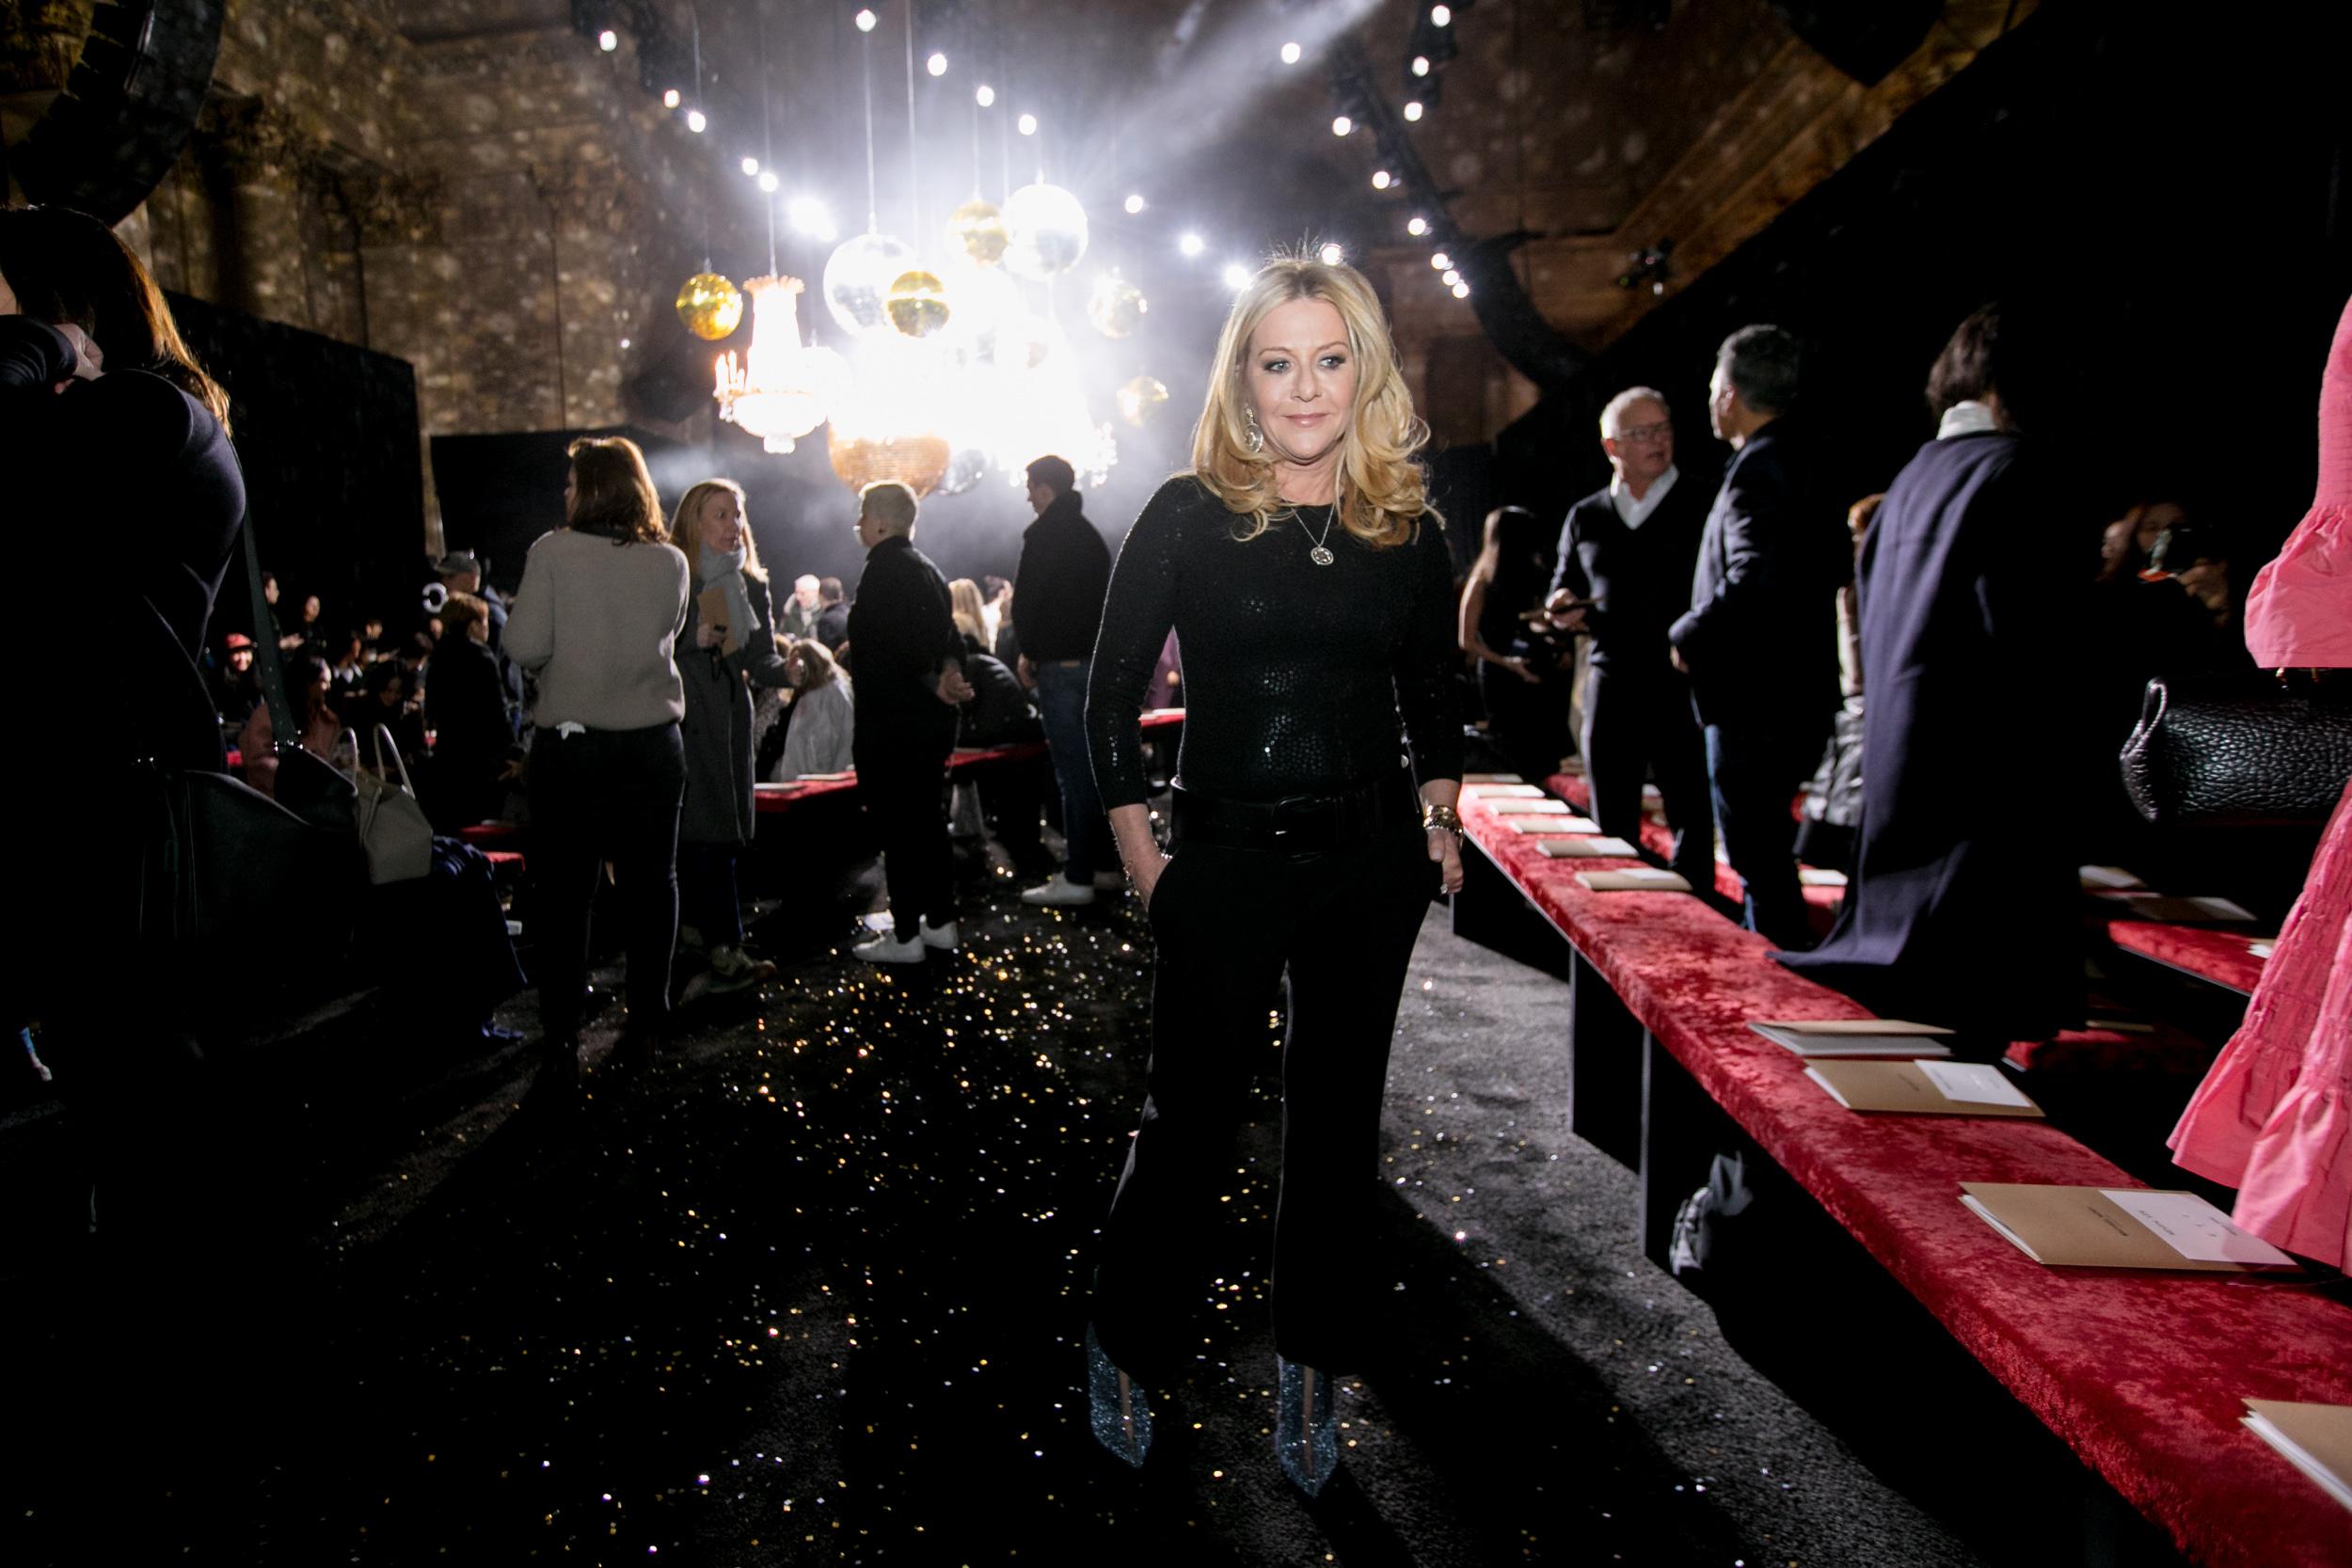 Michael Kors, New York Fashion Week 2019